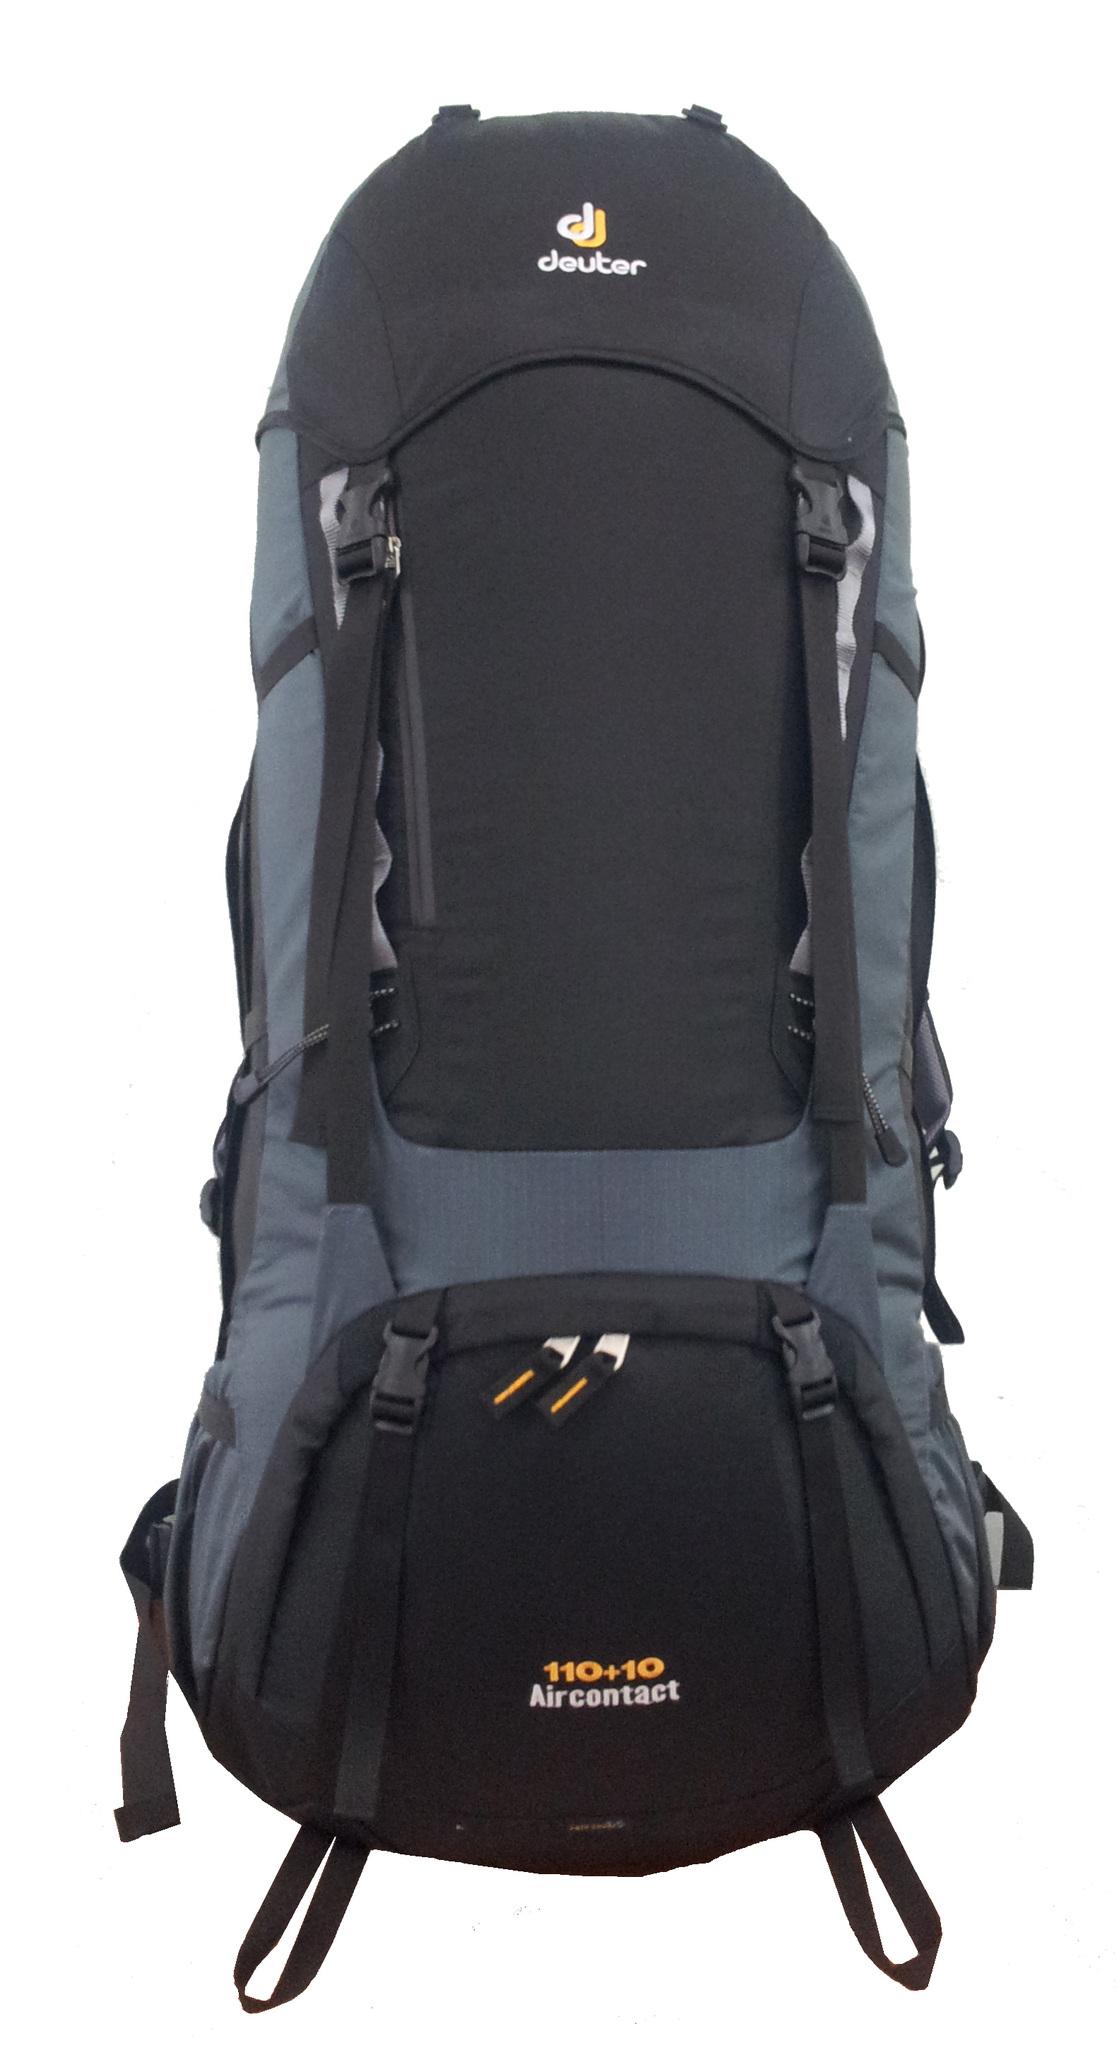 Туристические рюкзаки большие Рюкзак туристический Deuter Aircontact 110+10 9b908e3161903497de781d3bbb22d168.jpg